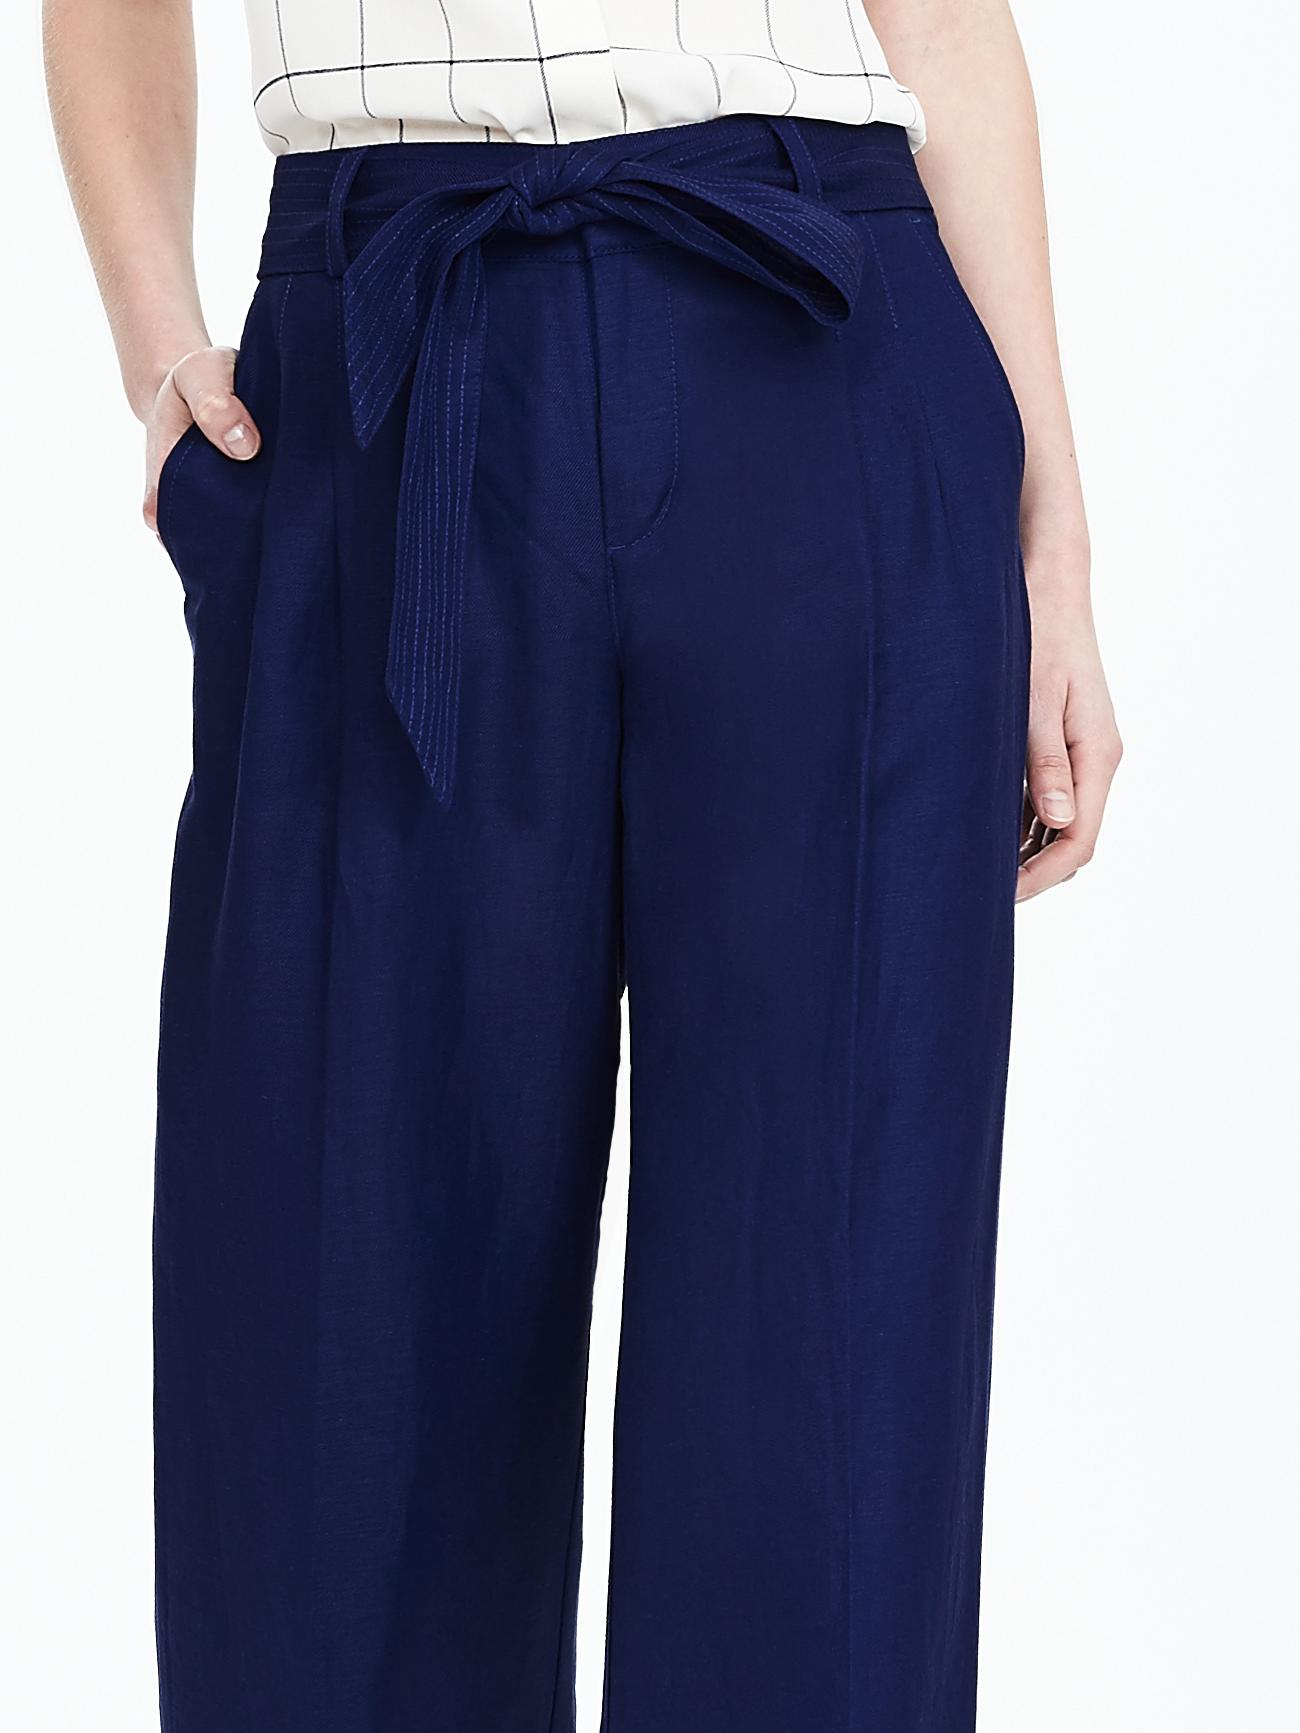 Banana republic Linen blend Belted Wide leg Pant in Blue